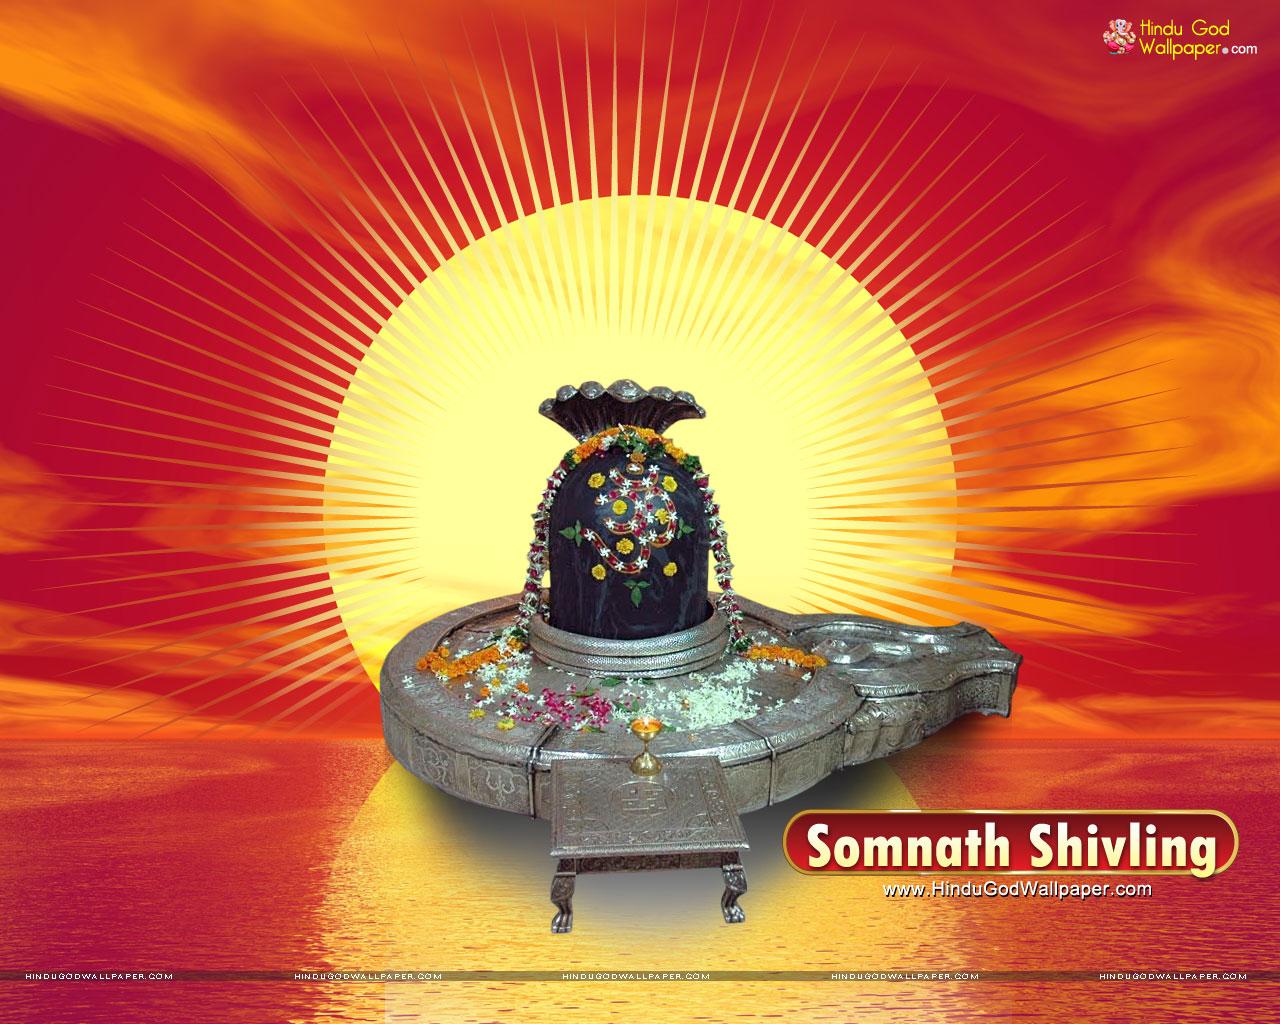 Somnath Shivling Wallpapers Free Download